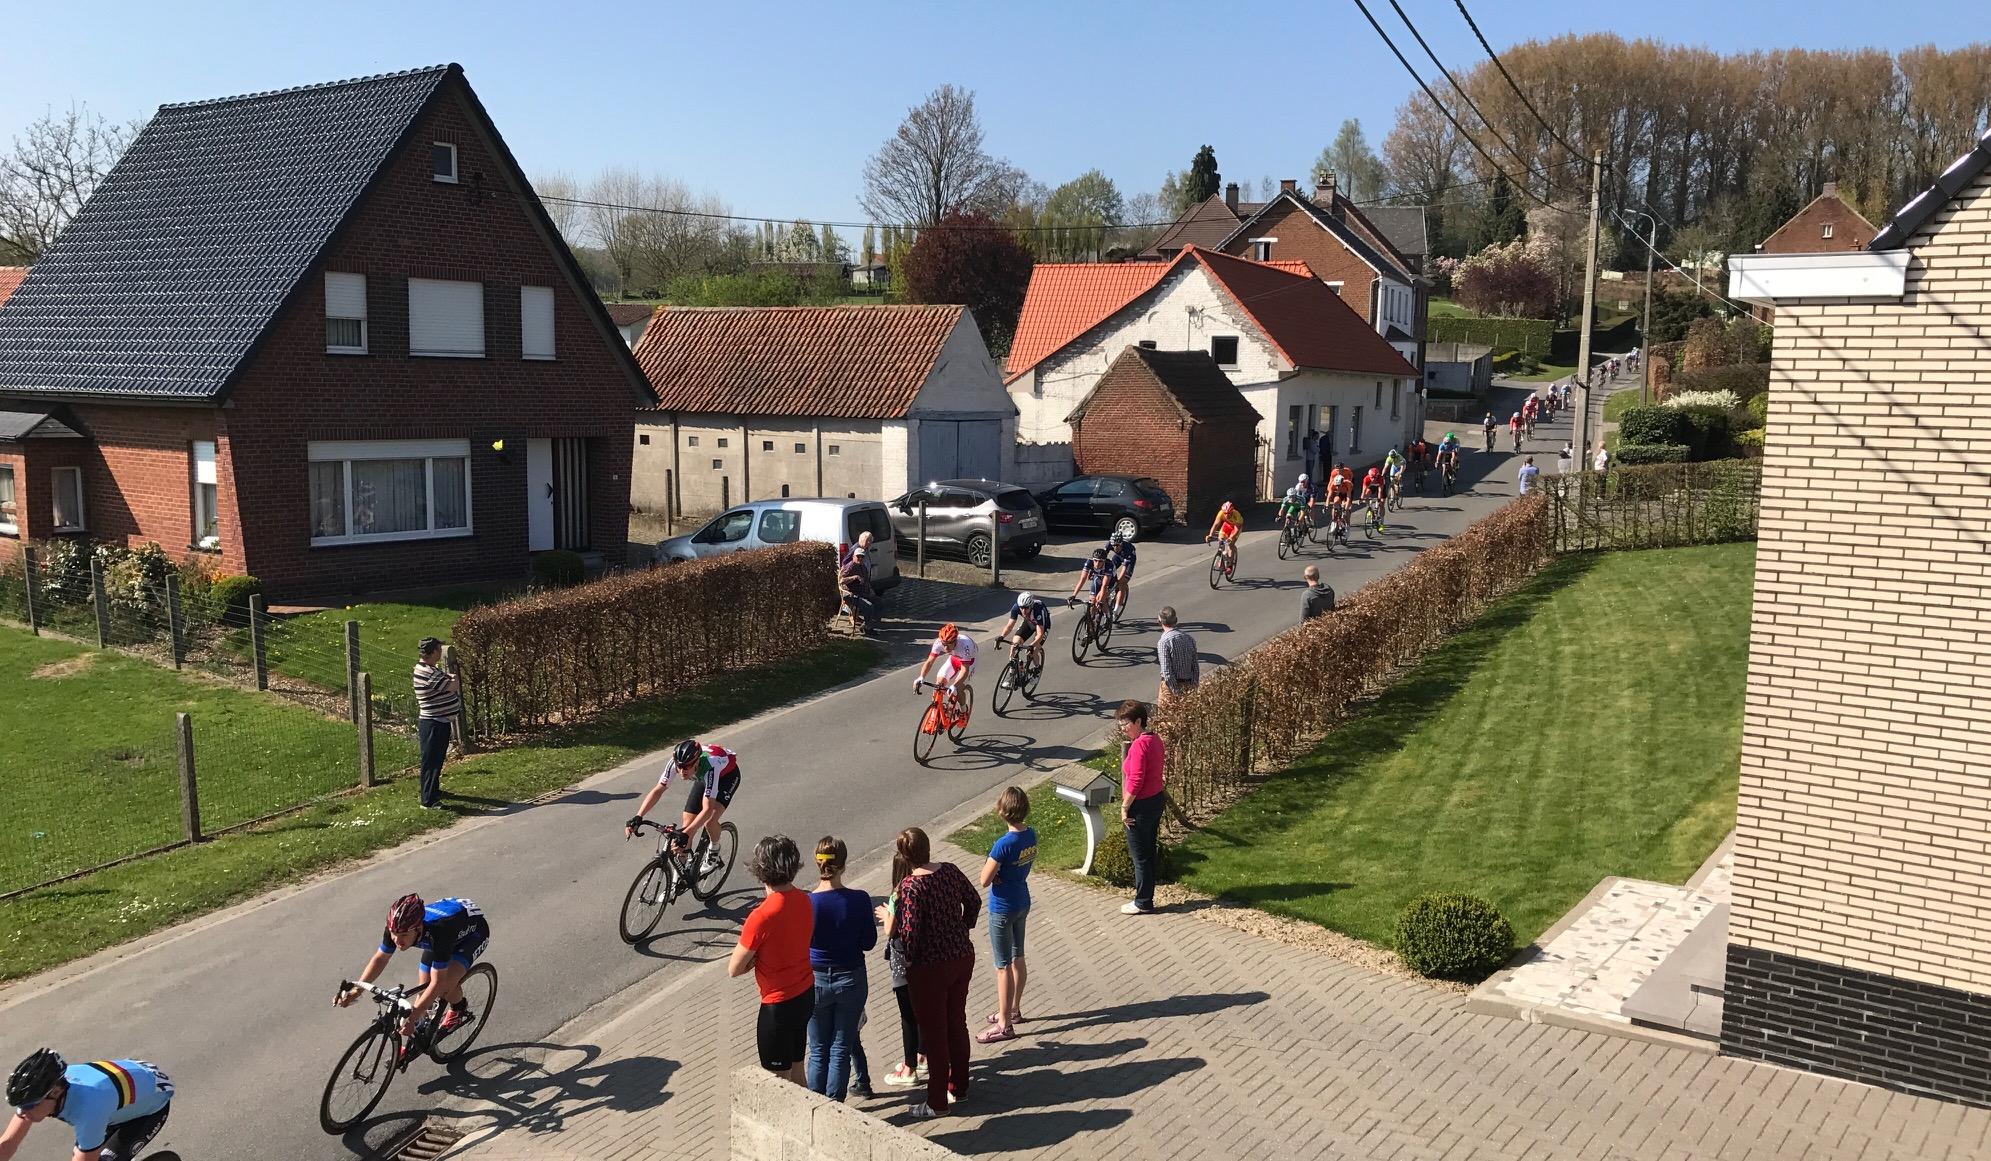 Ronde Van Vlaanderen Under 23 National Teams 17 - the peloton screams past the Kokerelle B&B